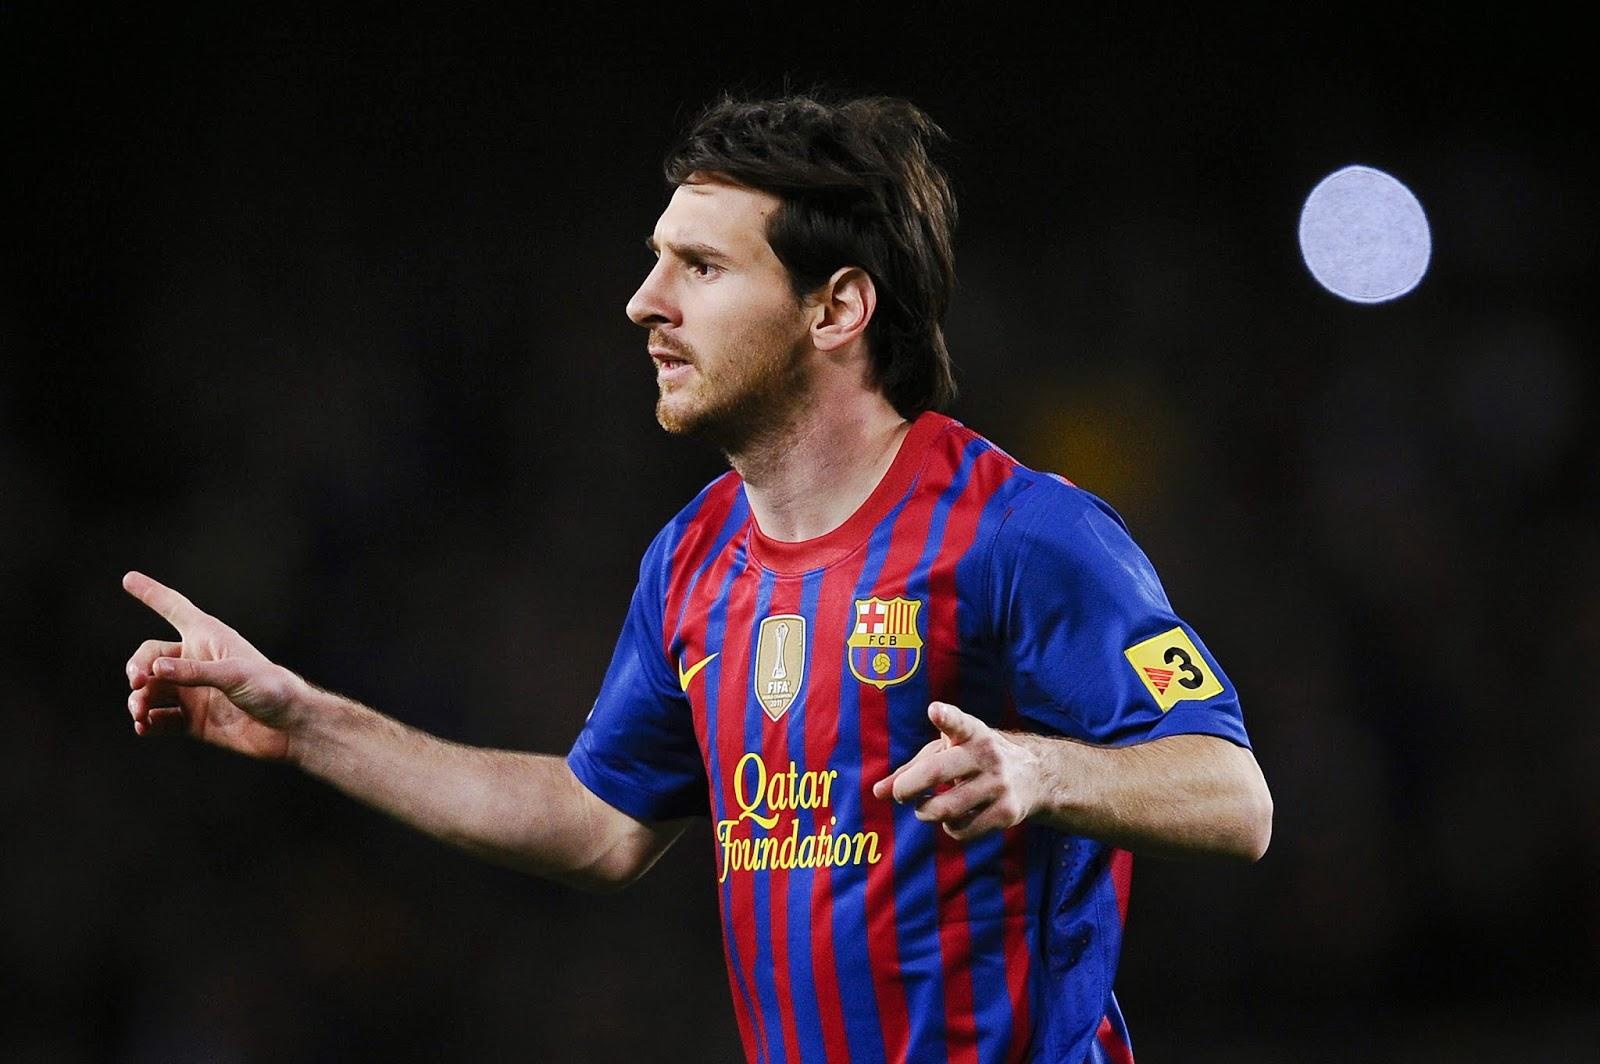 Lionel Messi Football Wallpapers Download Wallpaper Iku 1600x1064